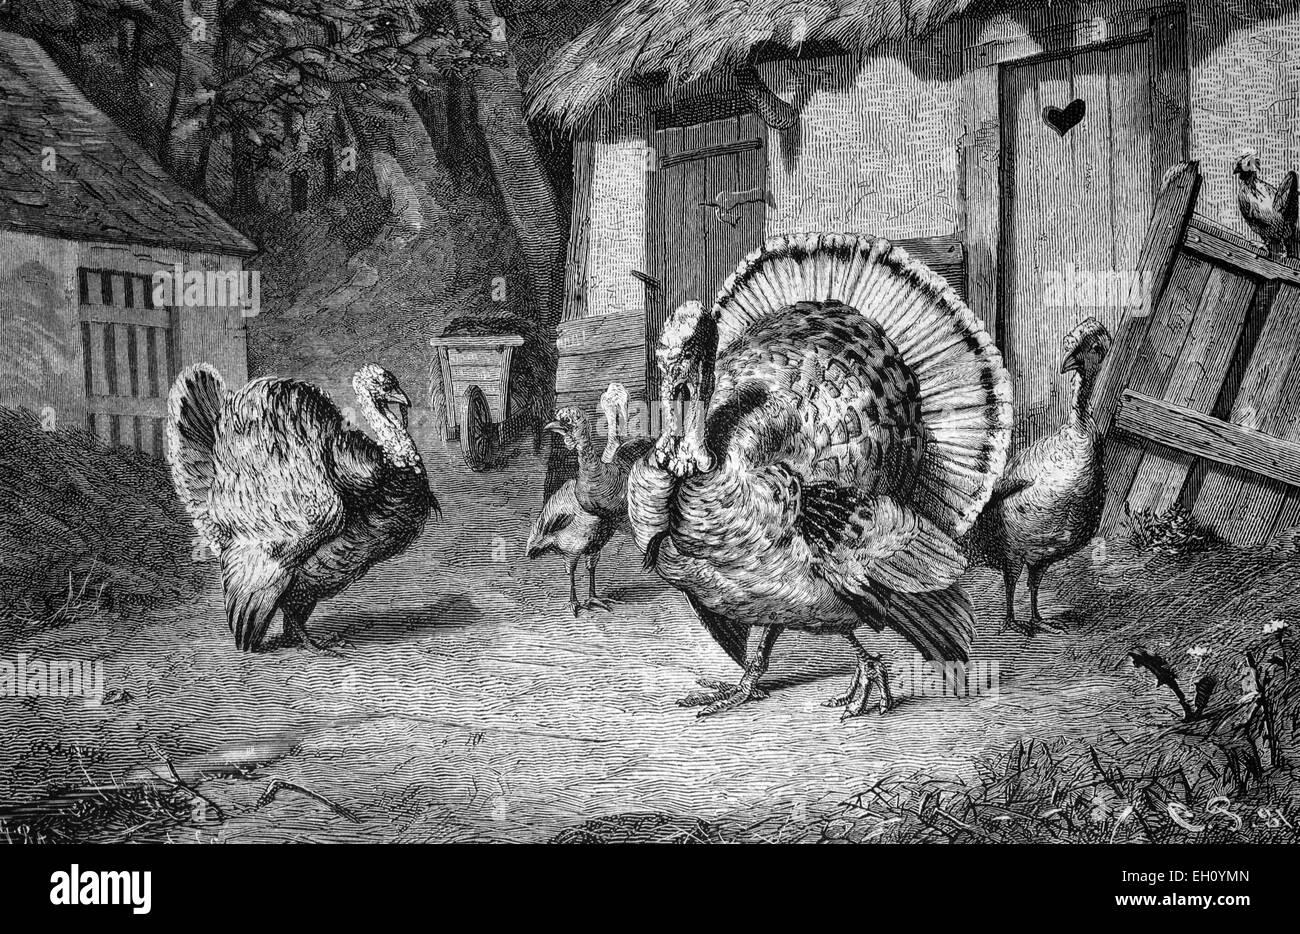 Turkeys, historical image 1886 Stock Photo